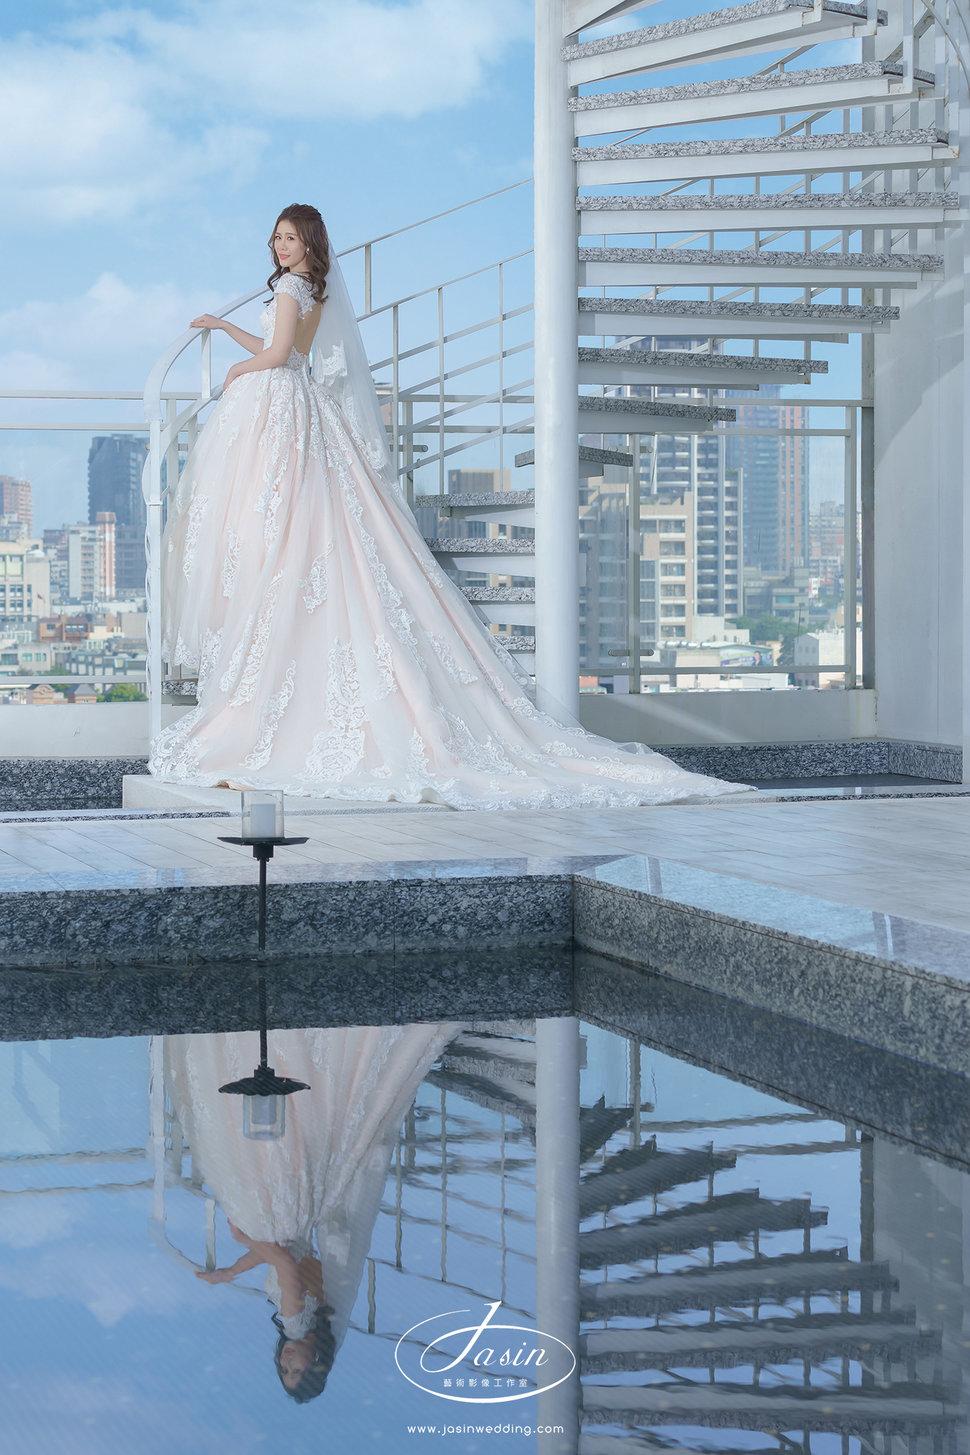 JASIN 萊特薇庭 (15) - Jasin藝術影像工作室《結婚吧》